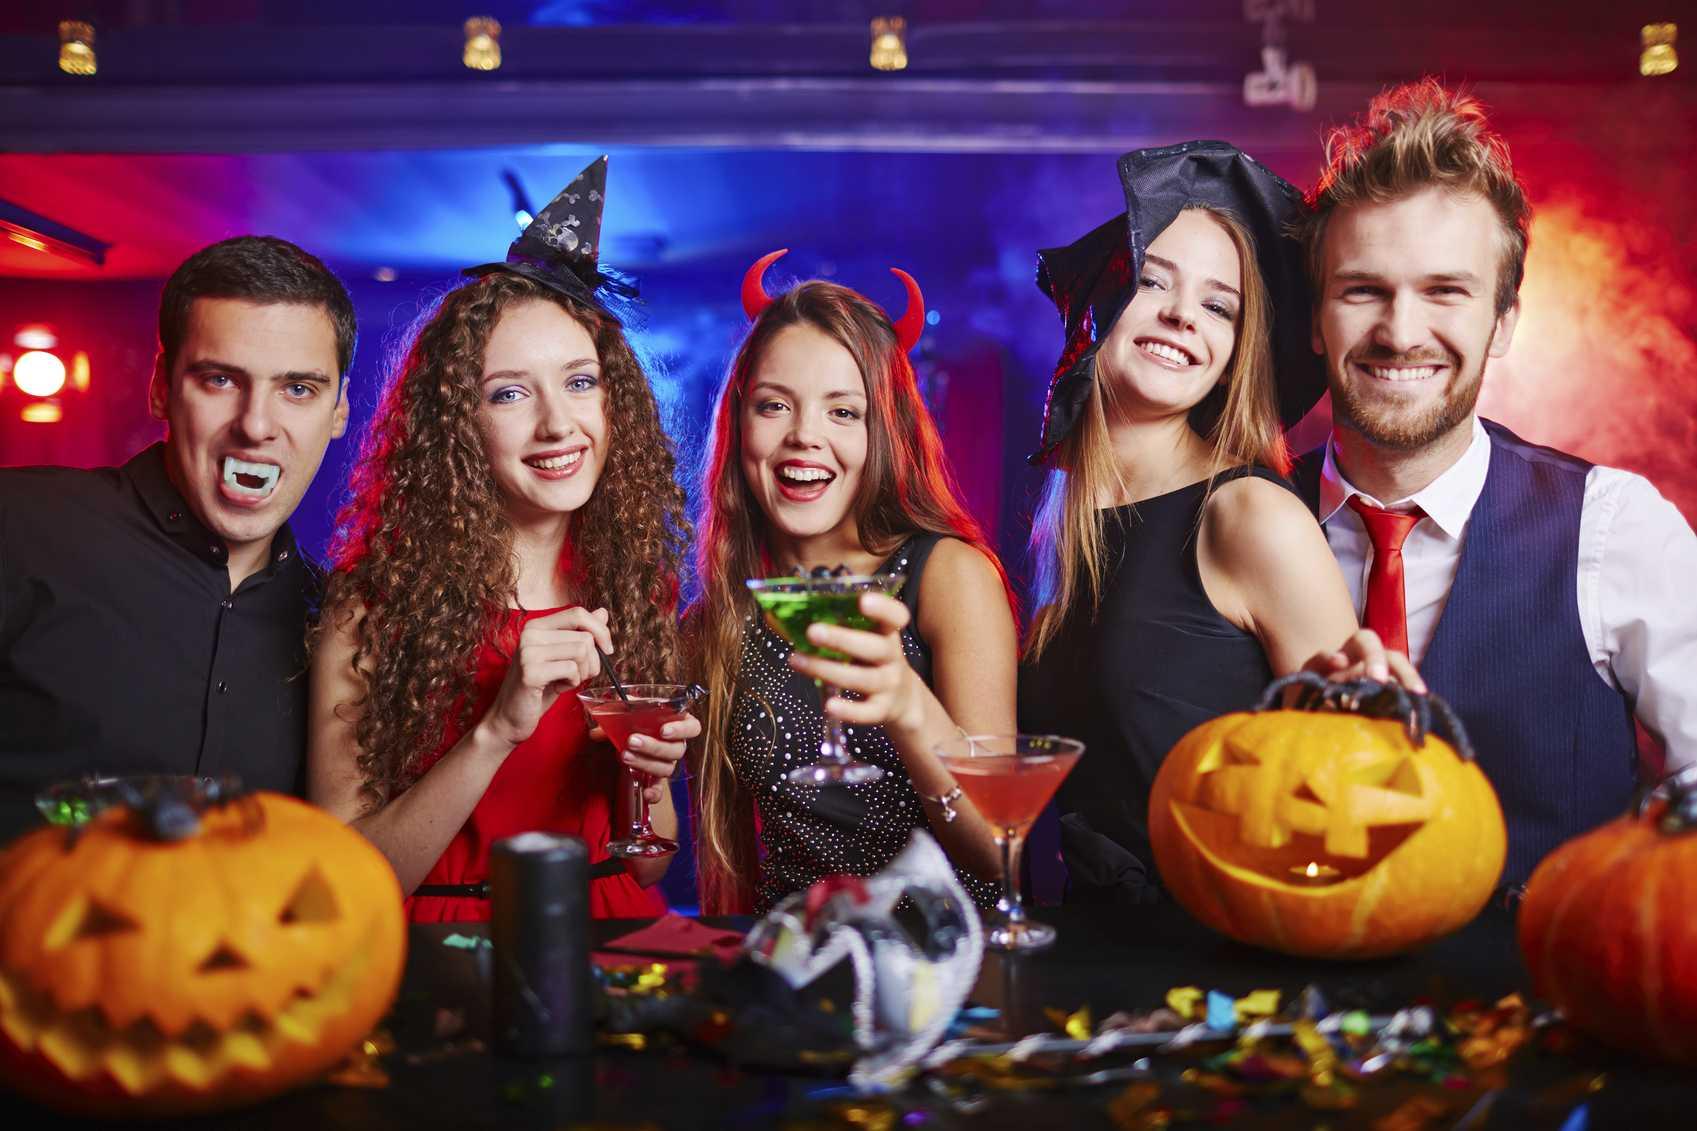 Diabetes and Halloween